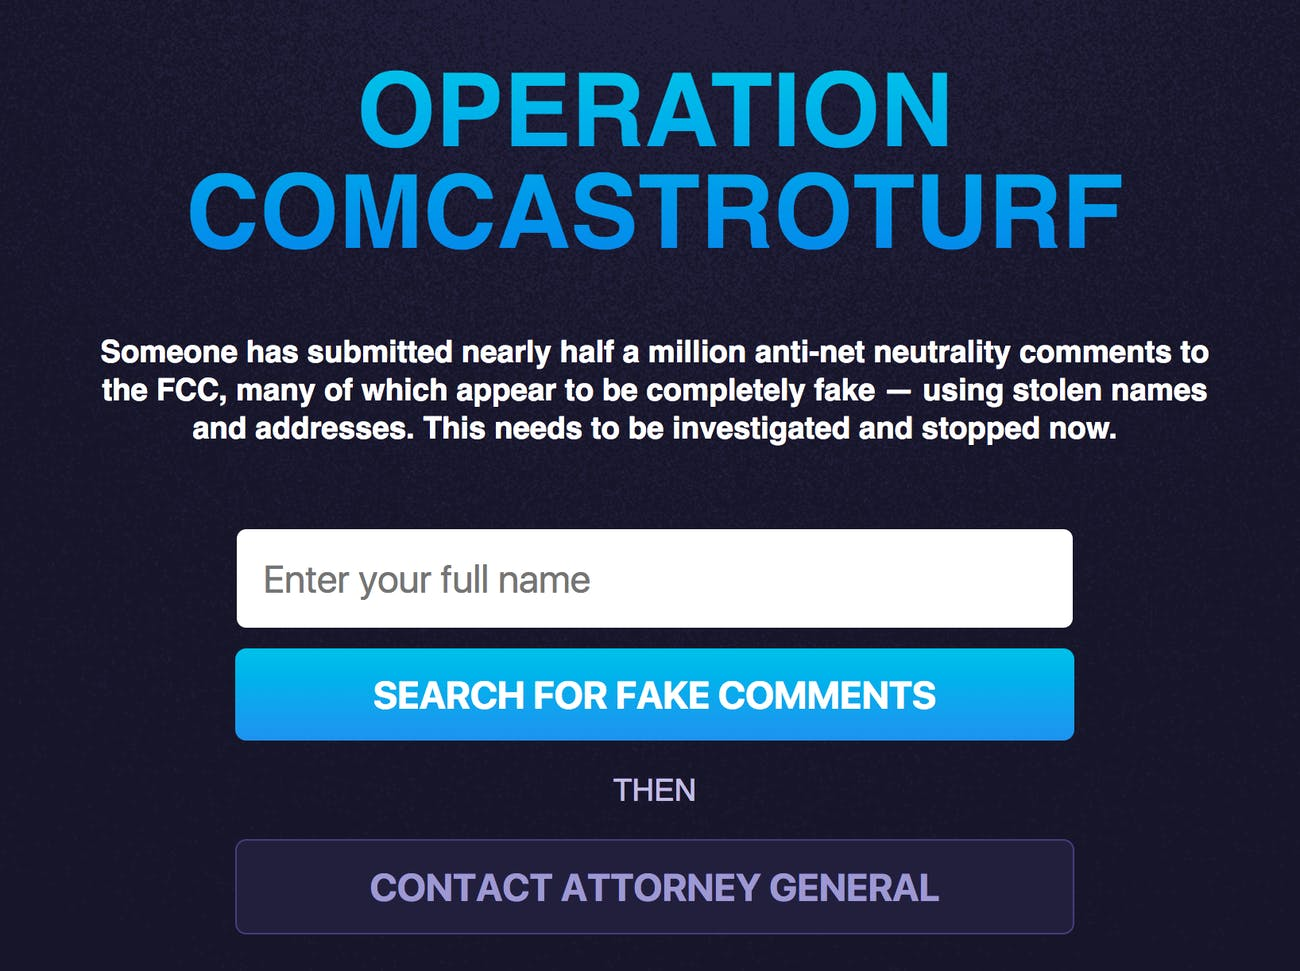 Comcast Threatens to Sue Pro-Net Neutrality Website